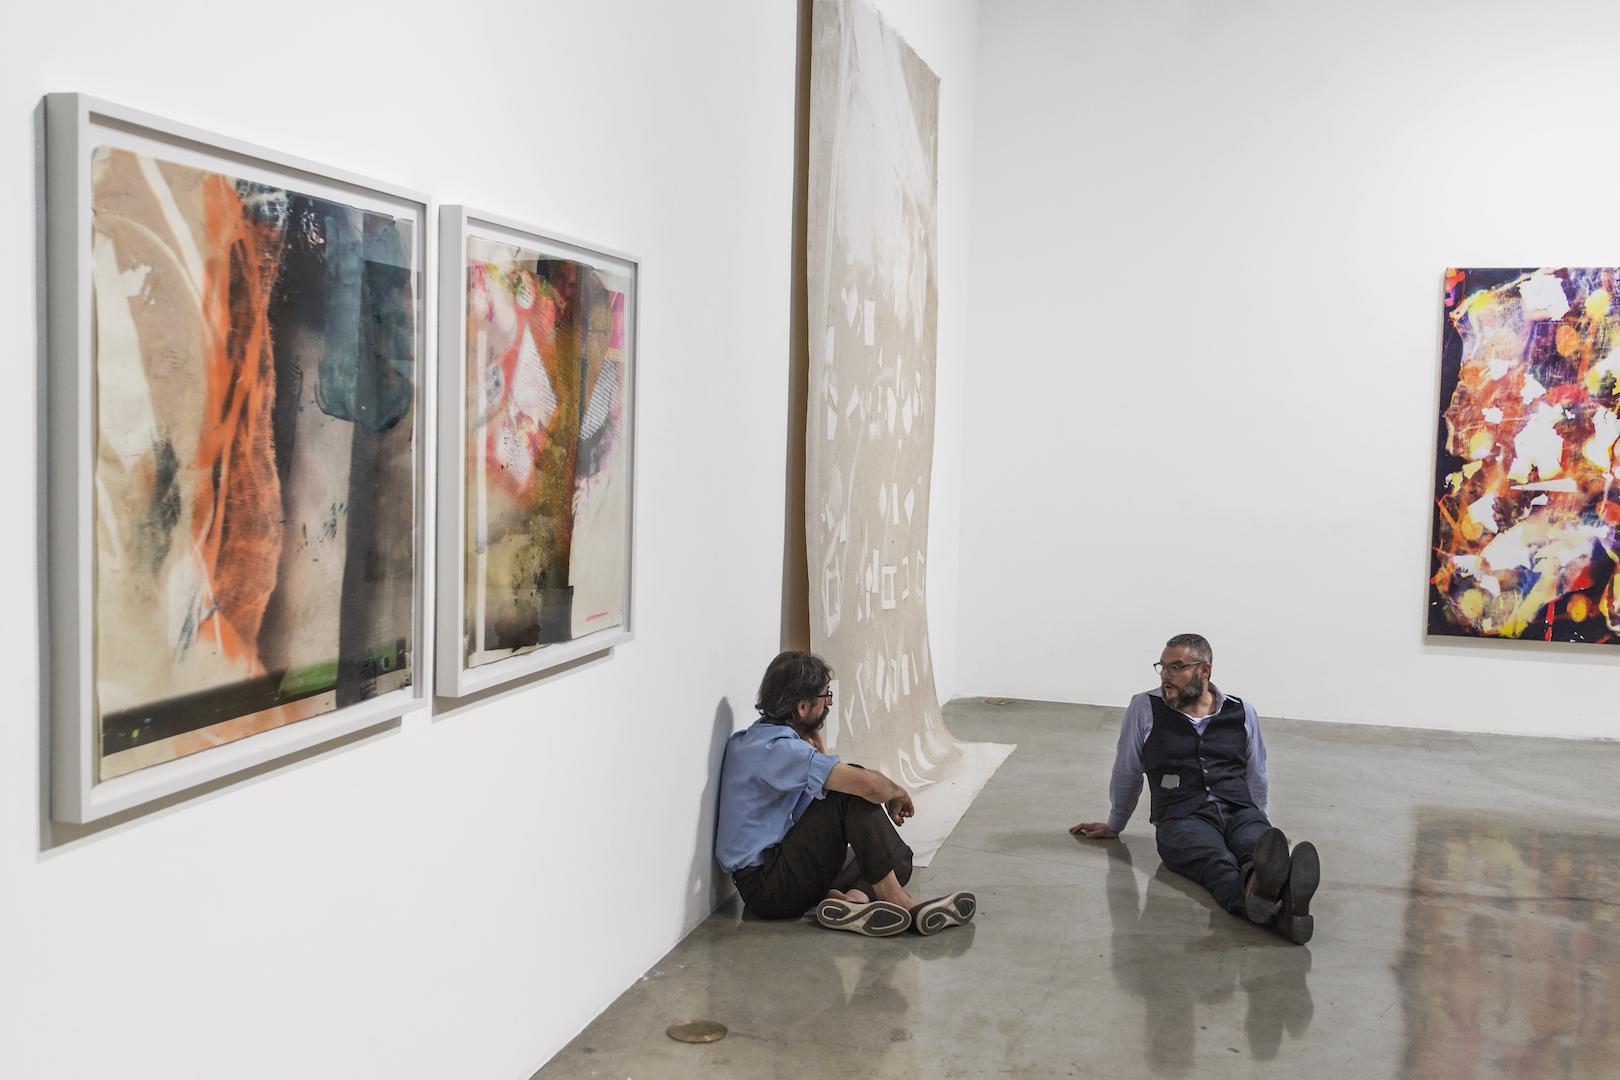 IAIN MUIRHEAD November 7 -11, 2016. Installation view East Gallery CGU, Claremont. Photo credit:Sam Kyser.